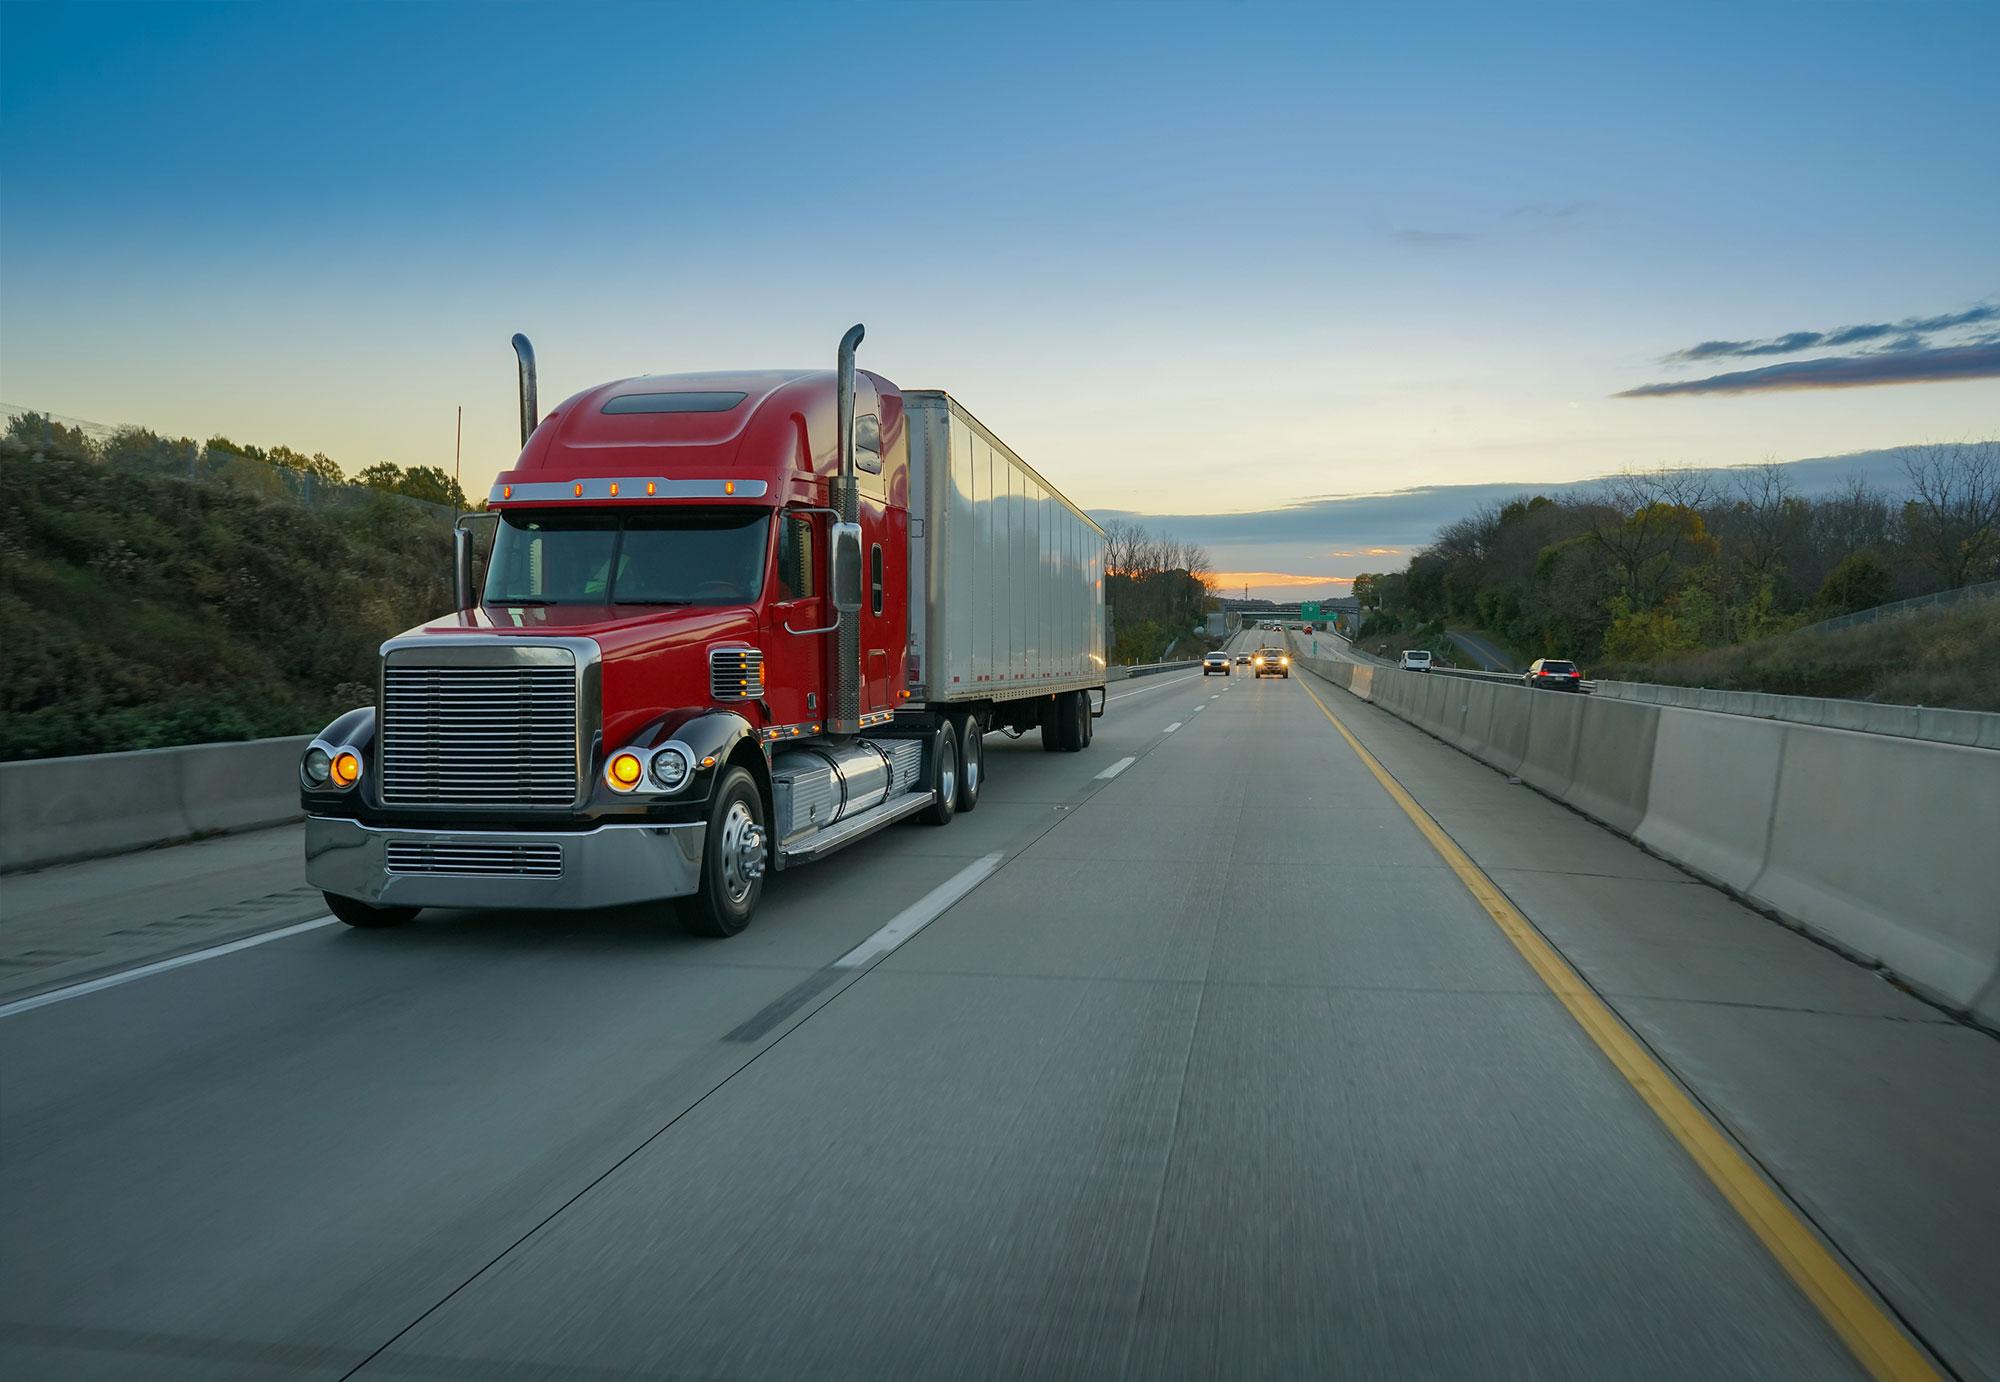 18-Wheeler & Company Vehicle Accidents | San Antonio, TX | Law